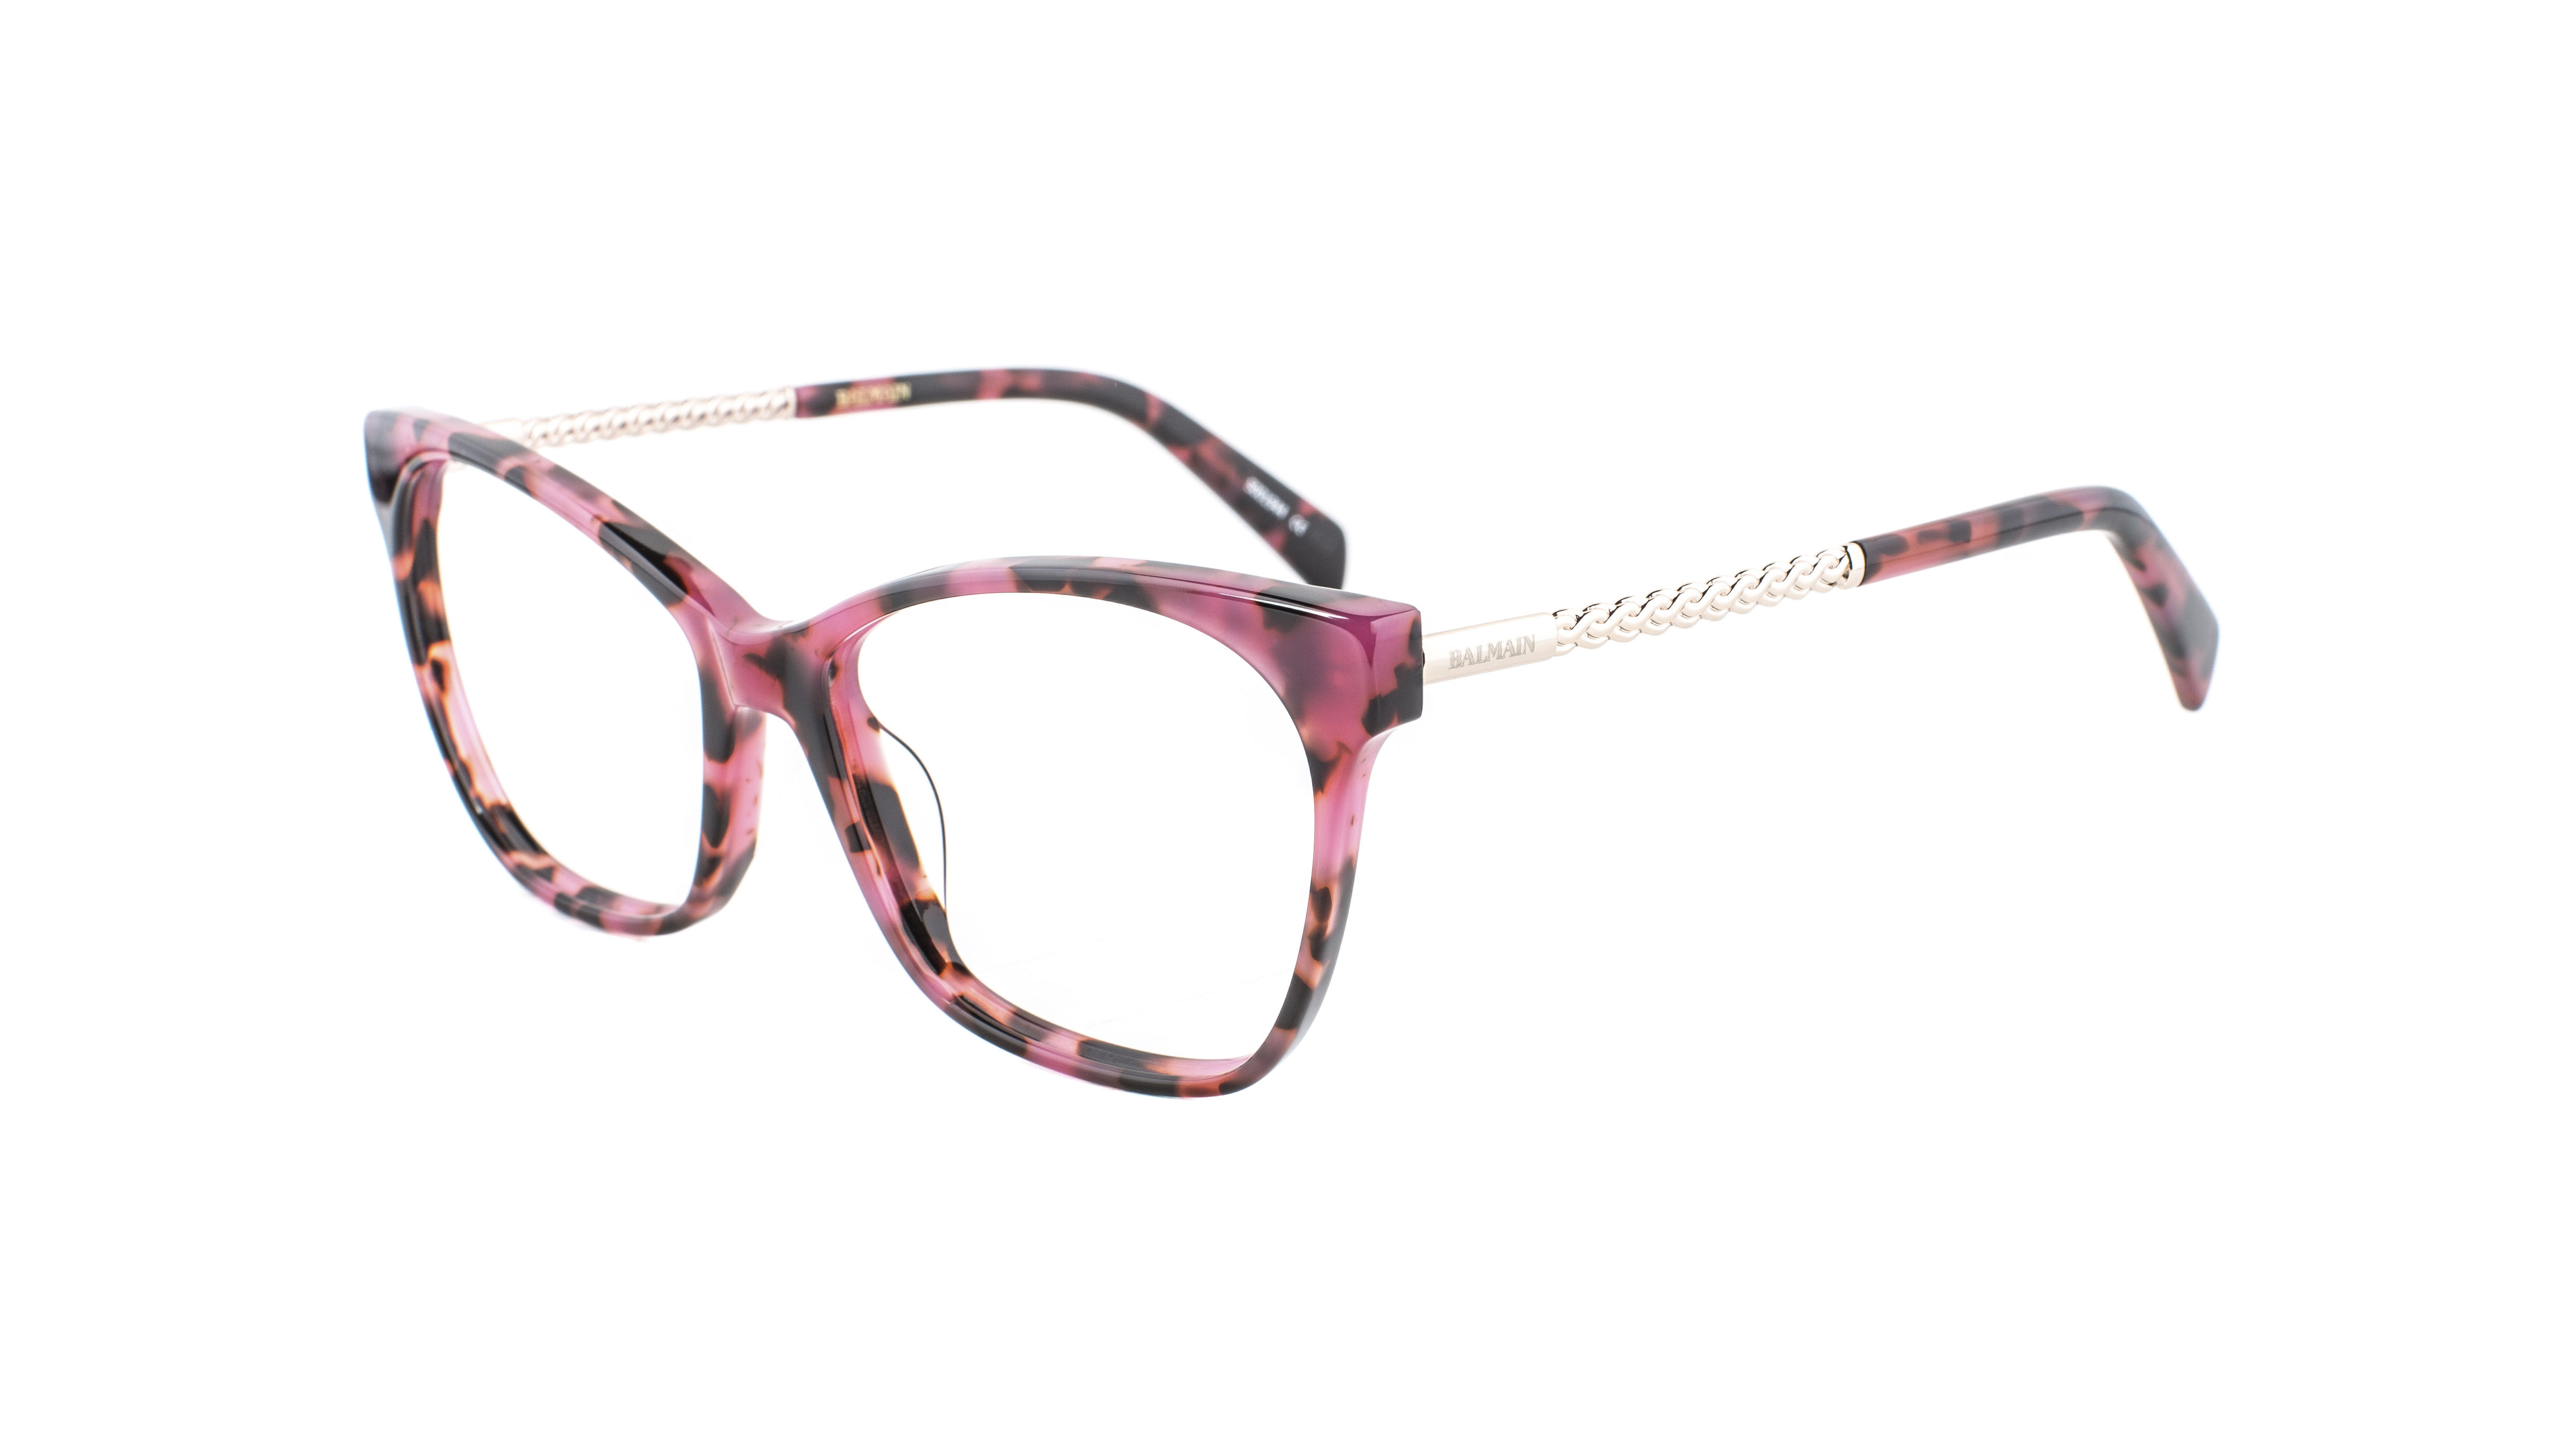 Balmain x Specsavers BL1510S 30570696 - RRP 2 pairs single vision $459